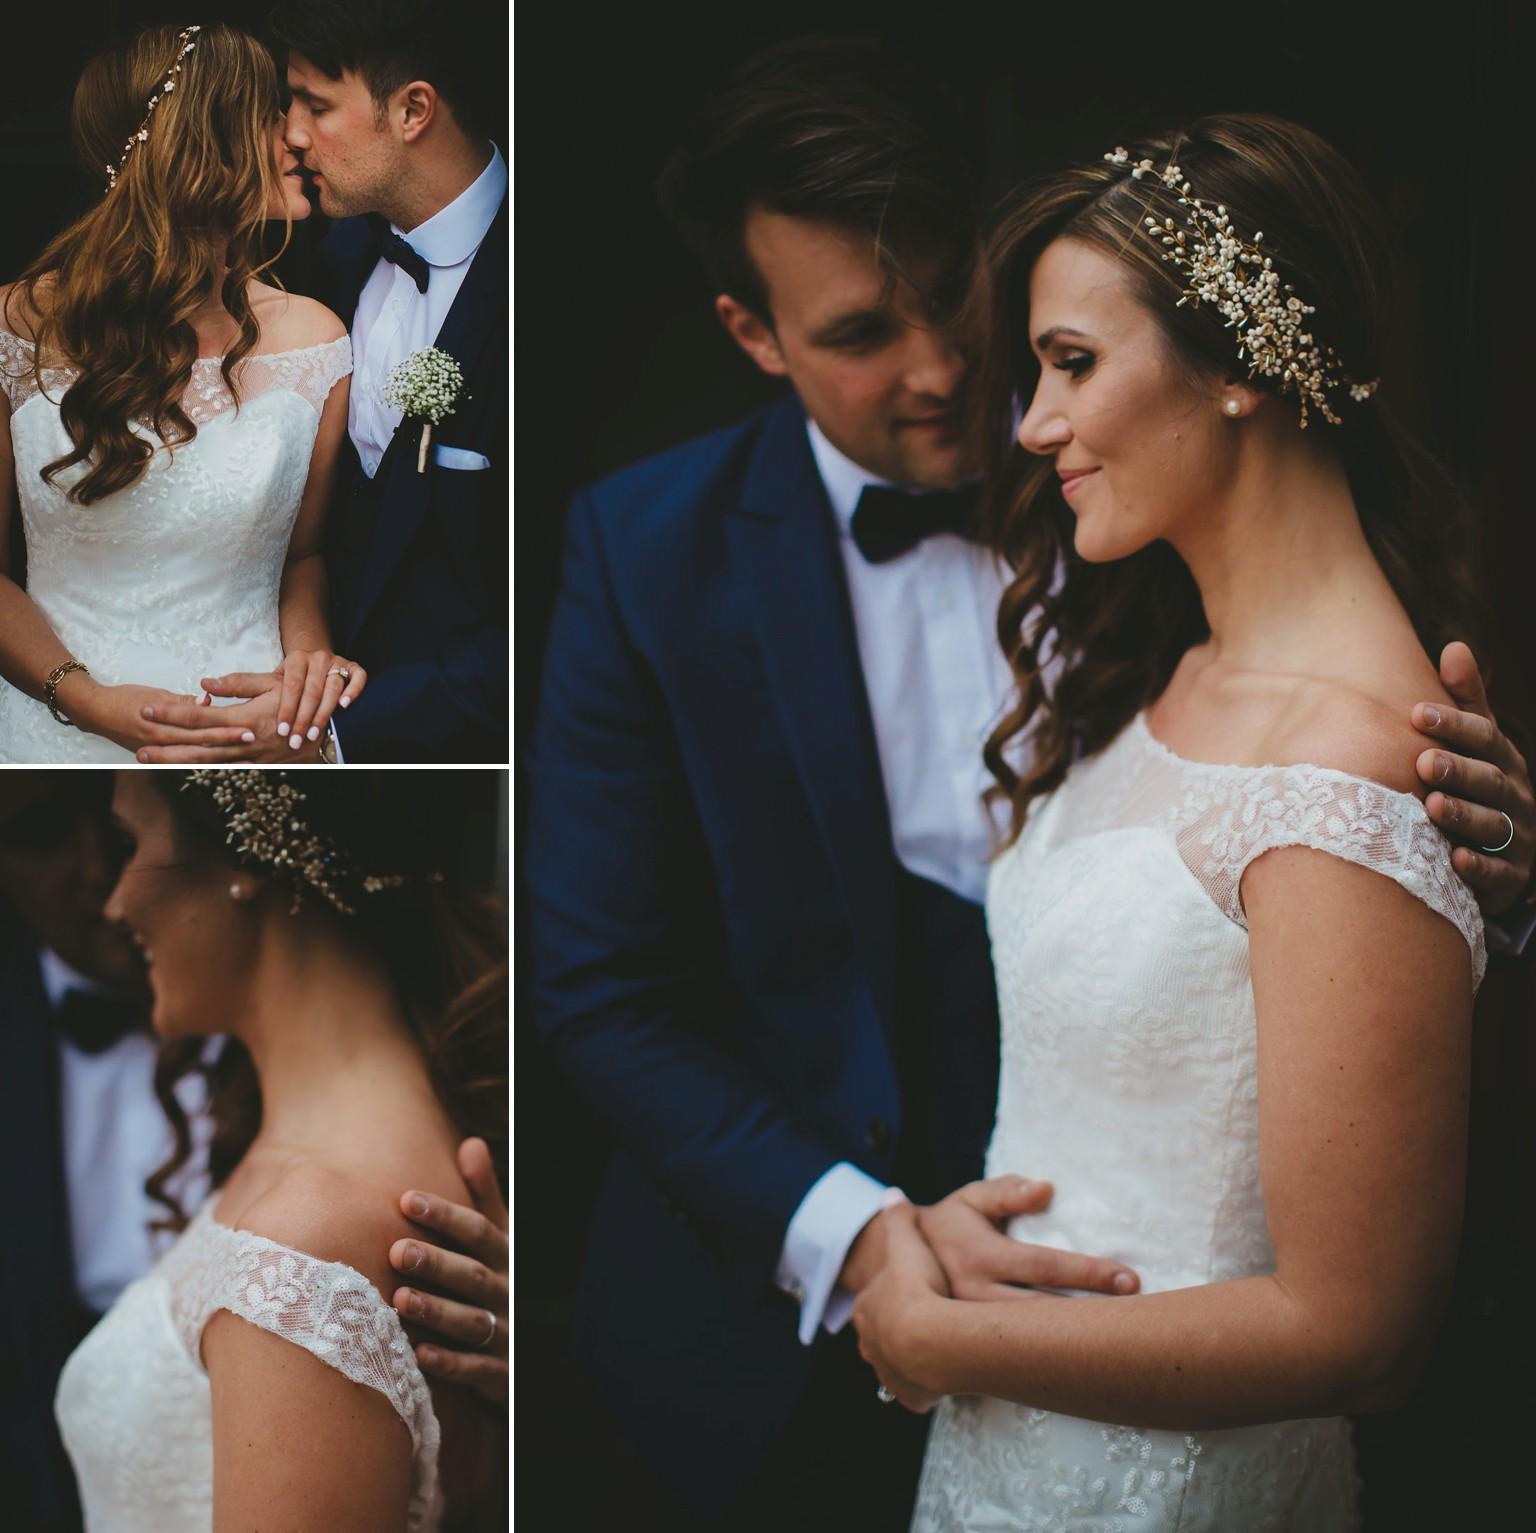 Creative-wedding-photographers-00001